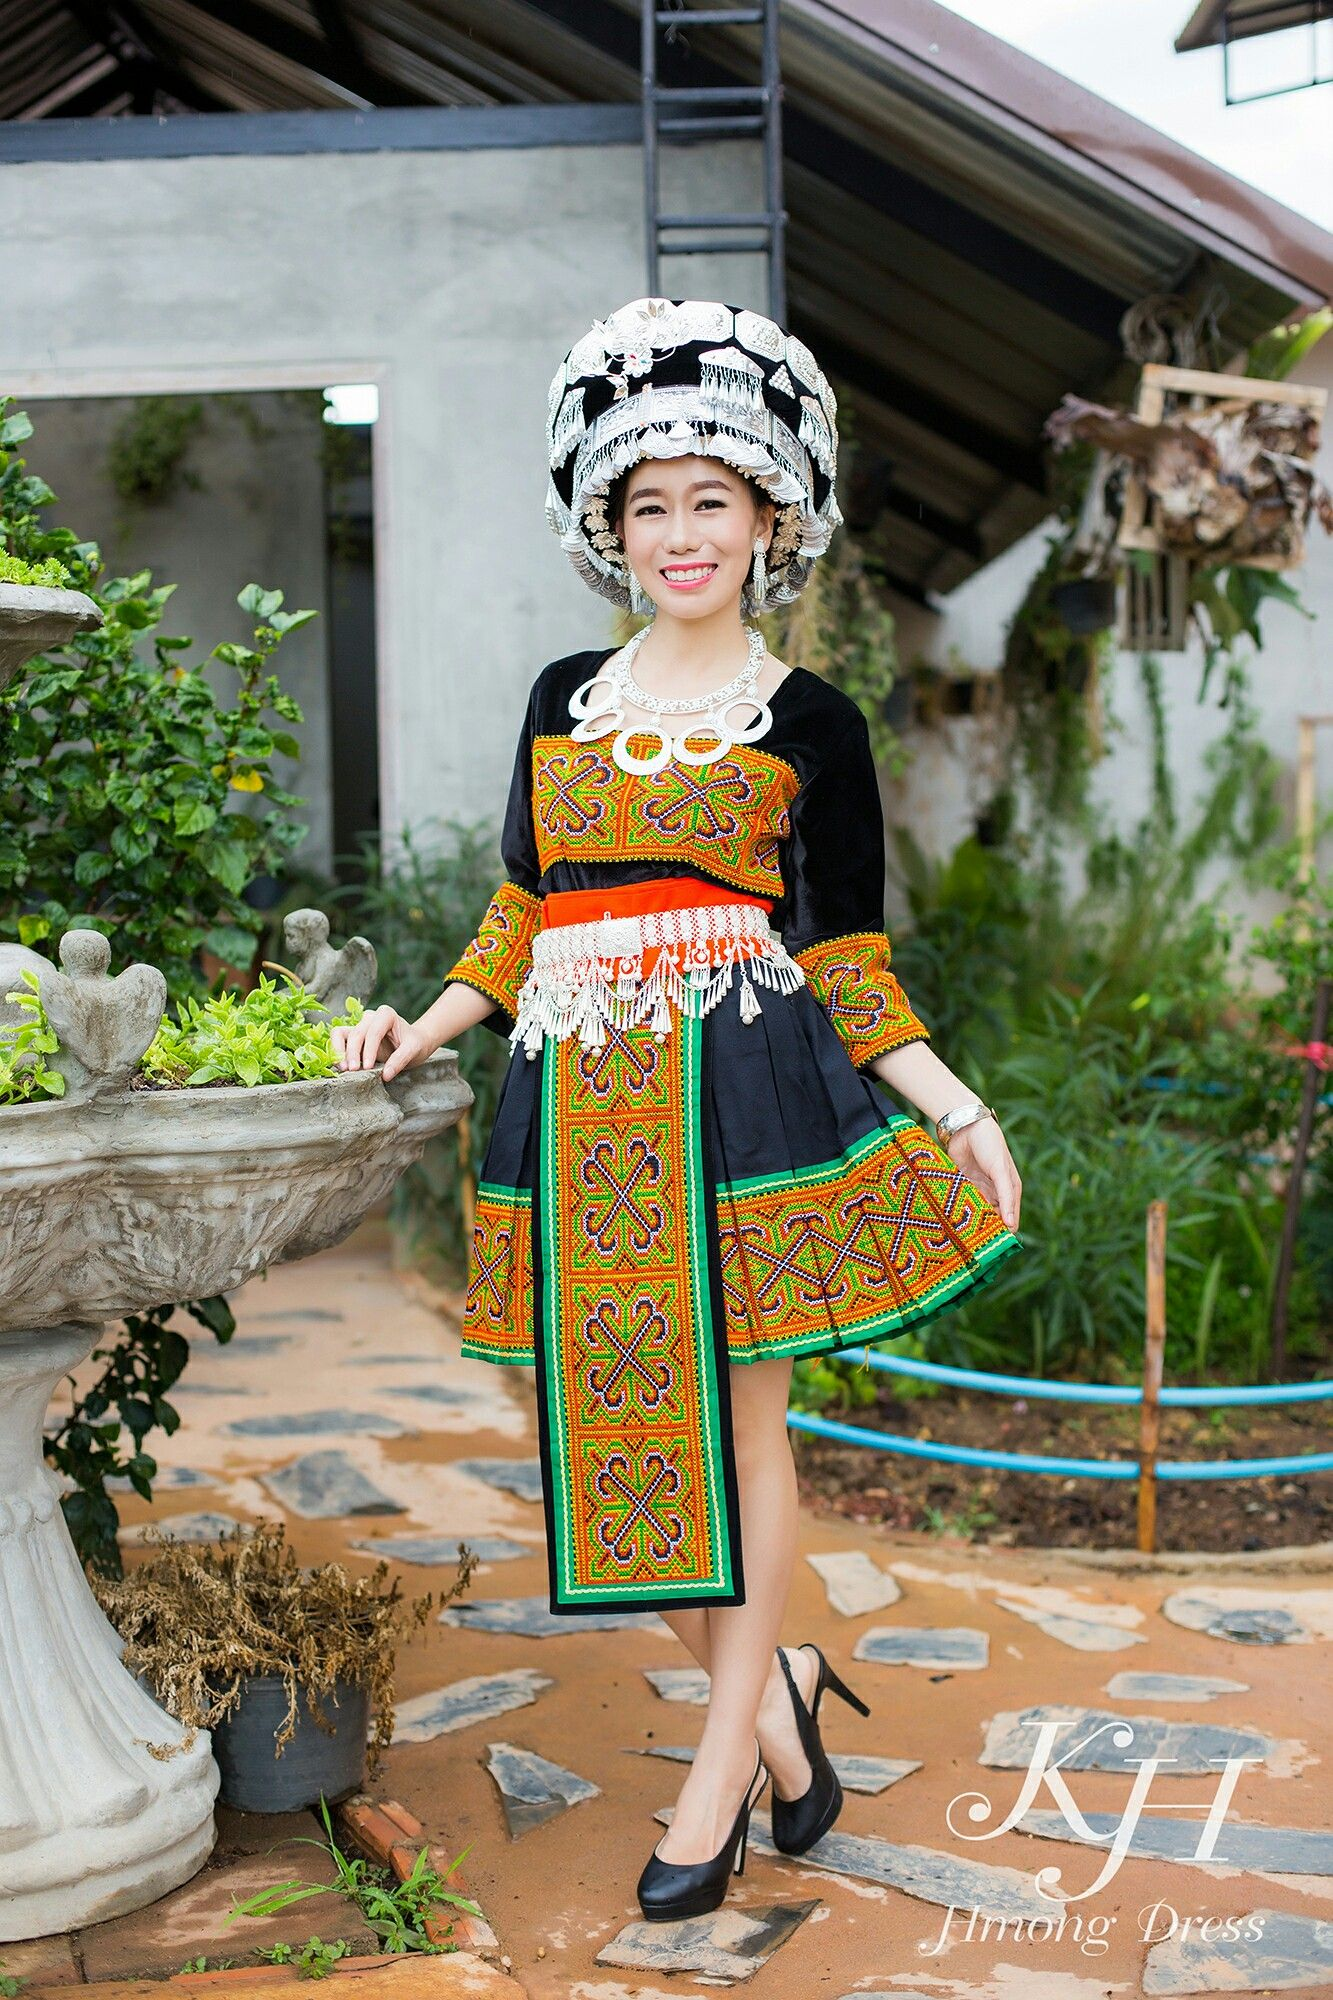 Berühmt Hmong Nähmustern Zeitgenössisch - Strickmuster-Ideen ...